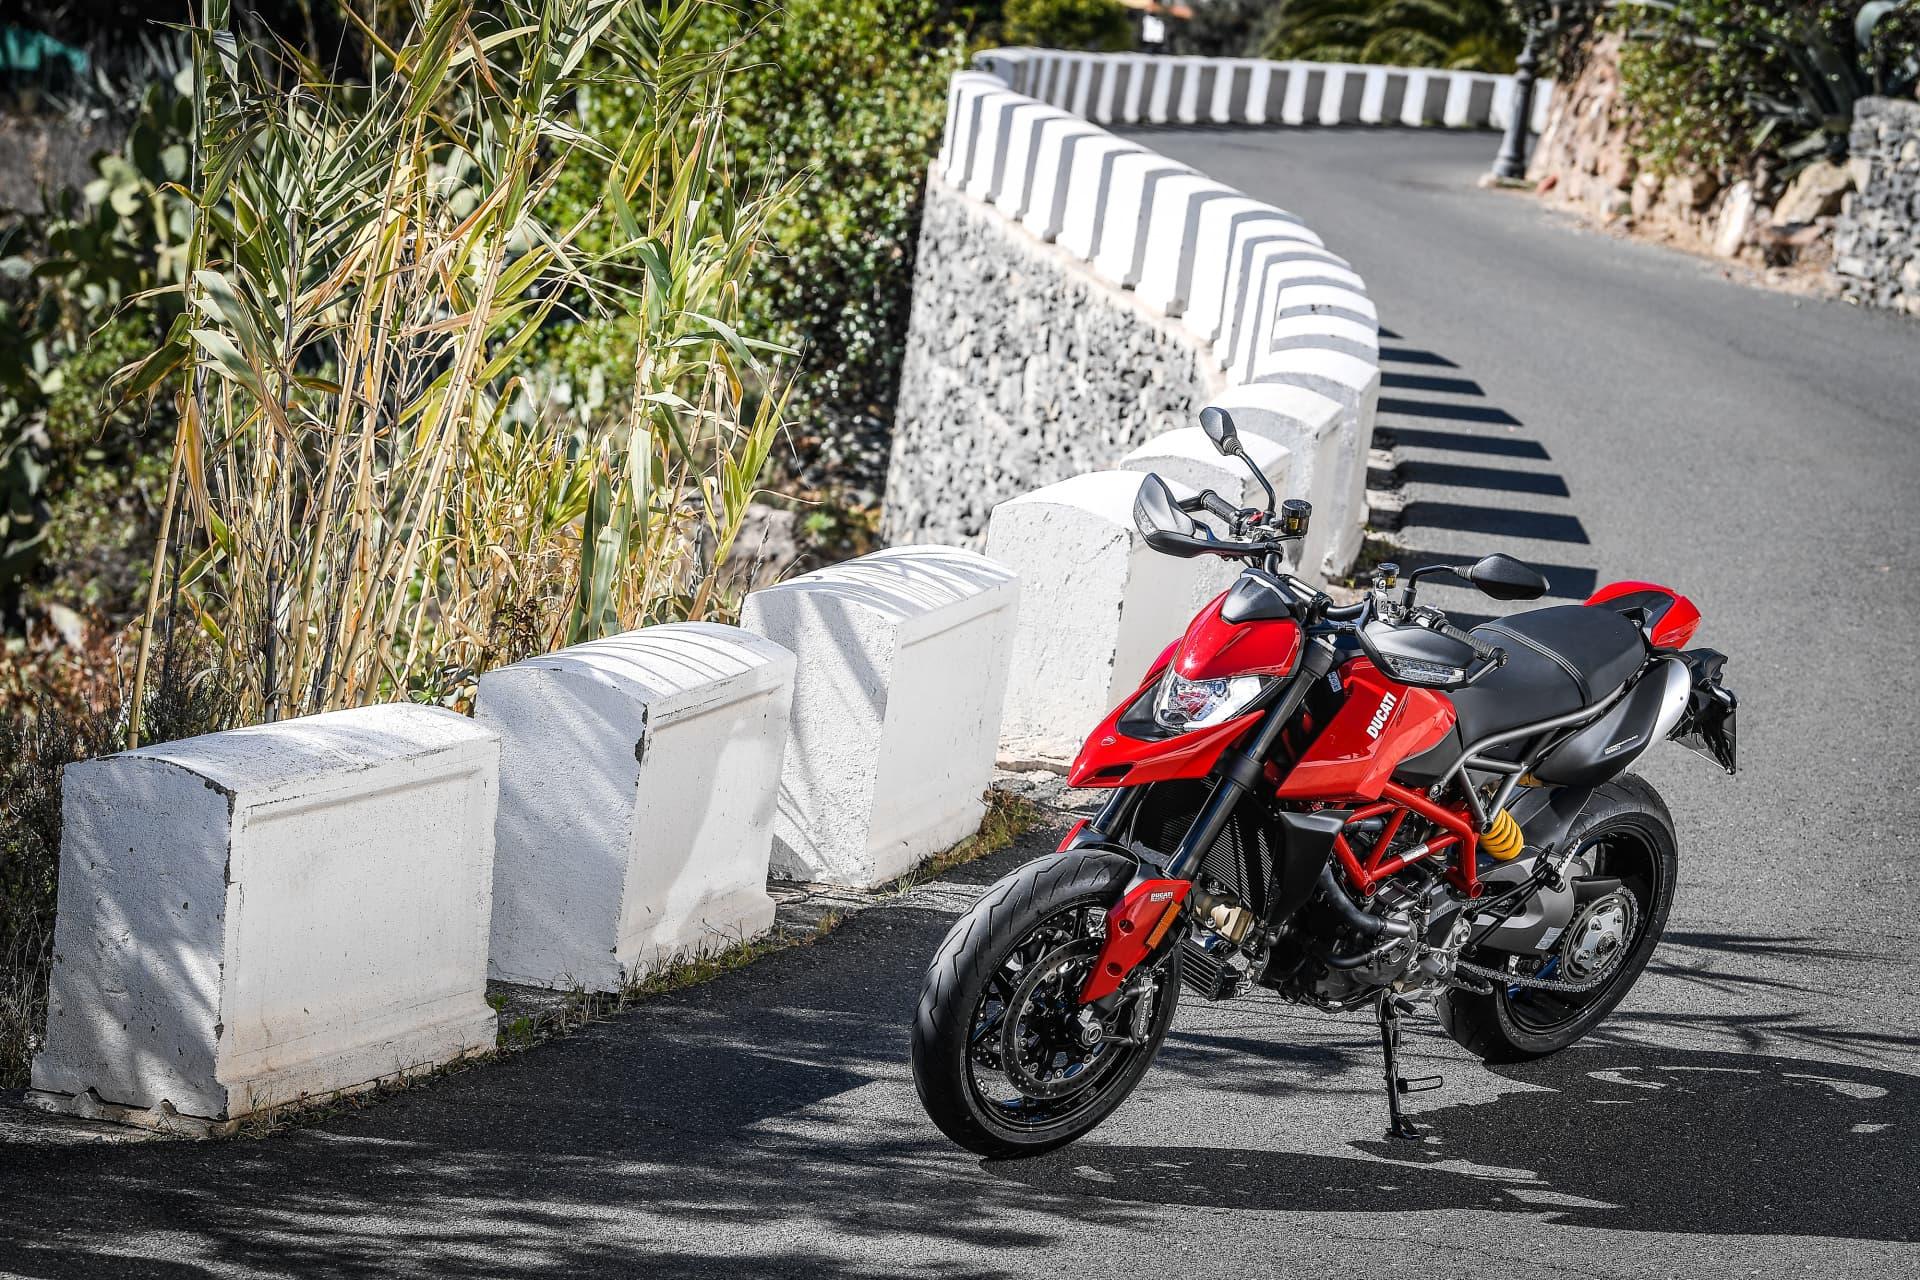 Ducati Hypermotard 950 Static 12 Uc70274 Mid